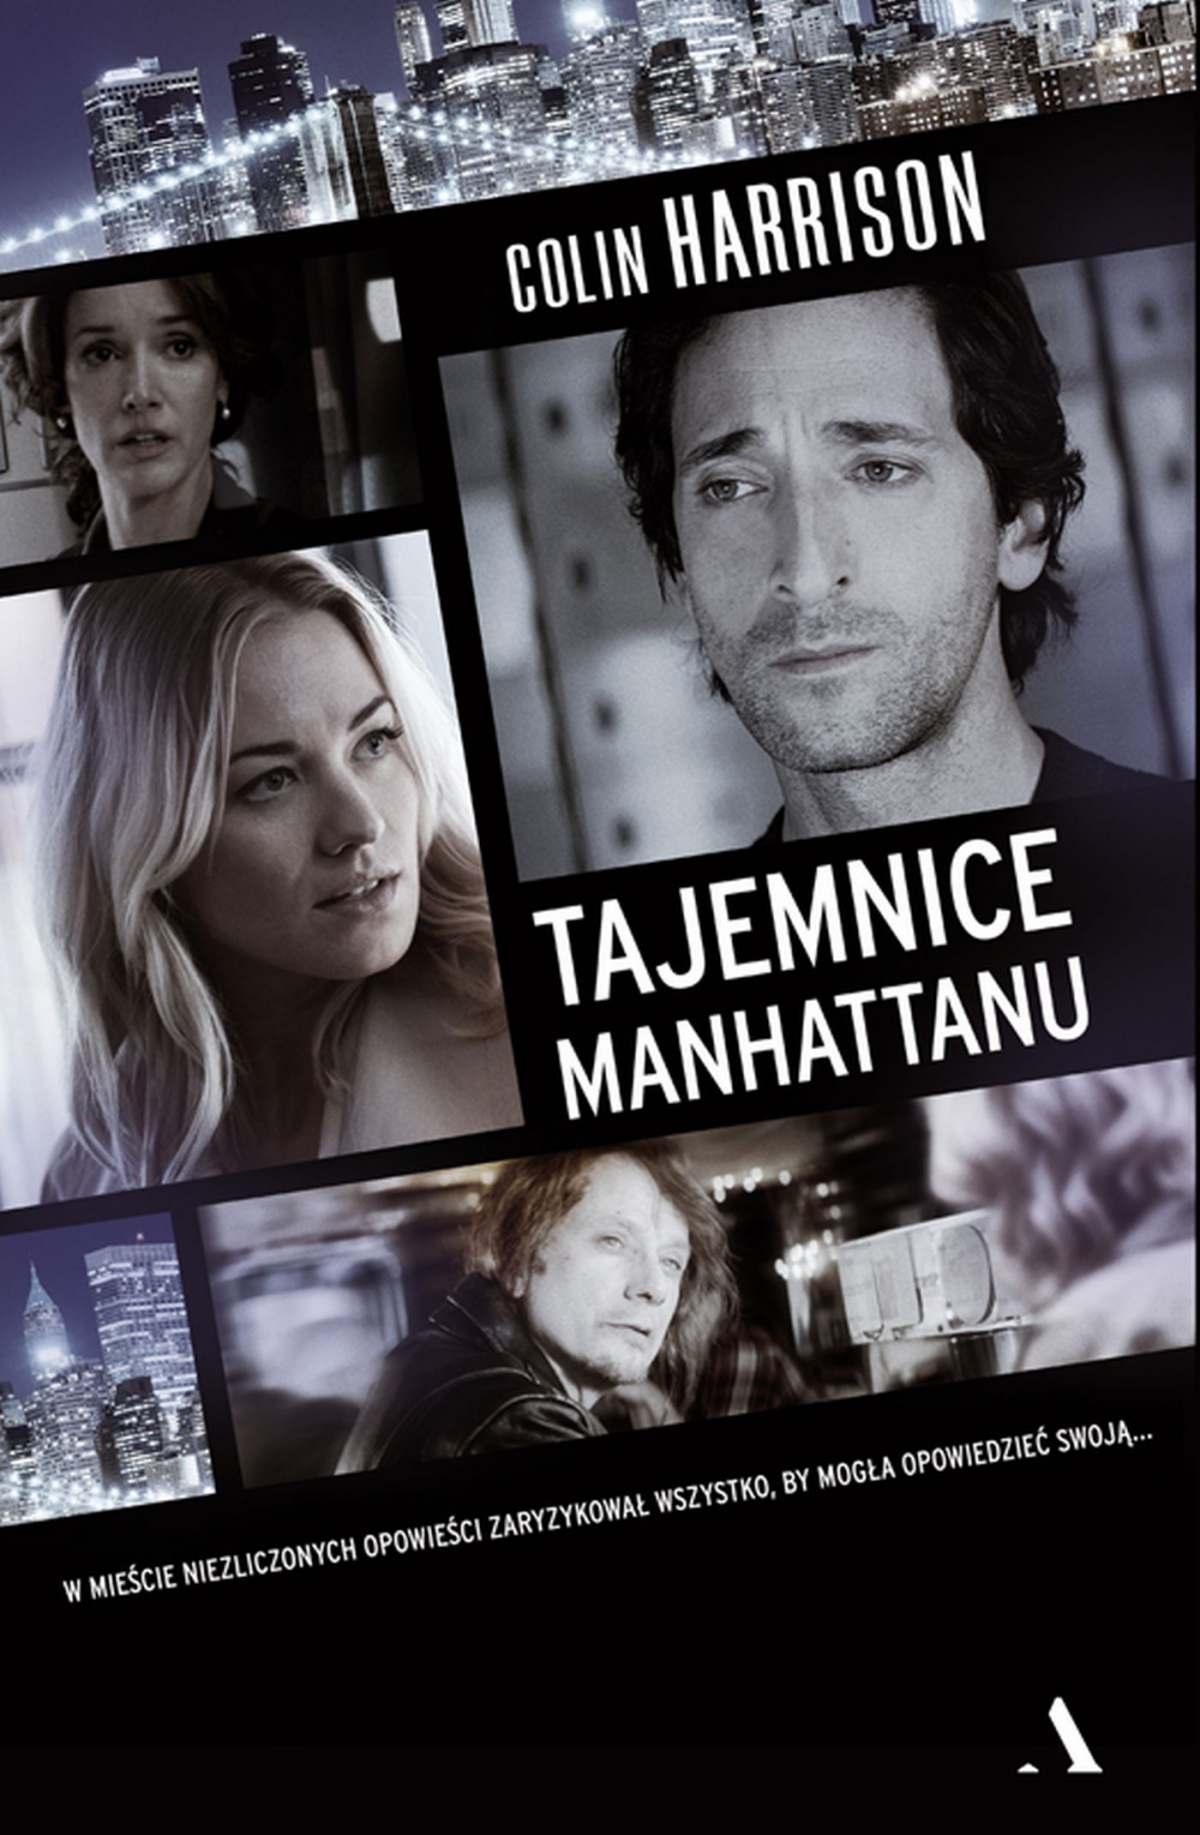 Tajemnice Manhattanu - Ebook (Książka na Kindle) do pobrania w formacie MOBI